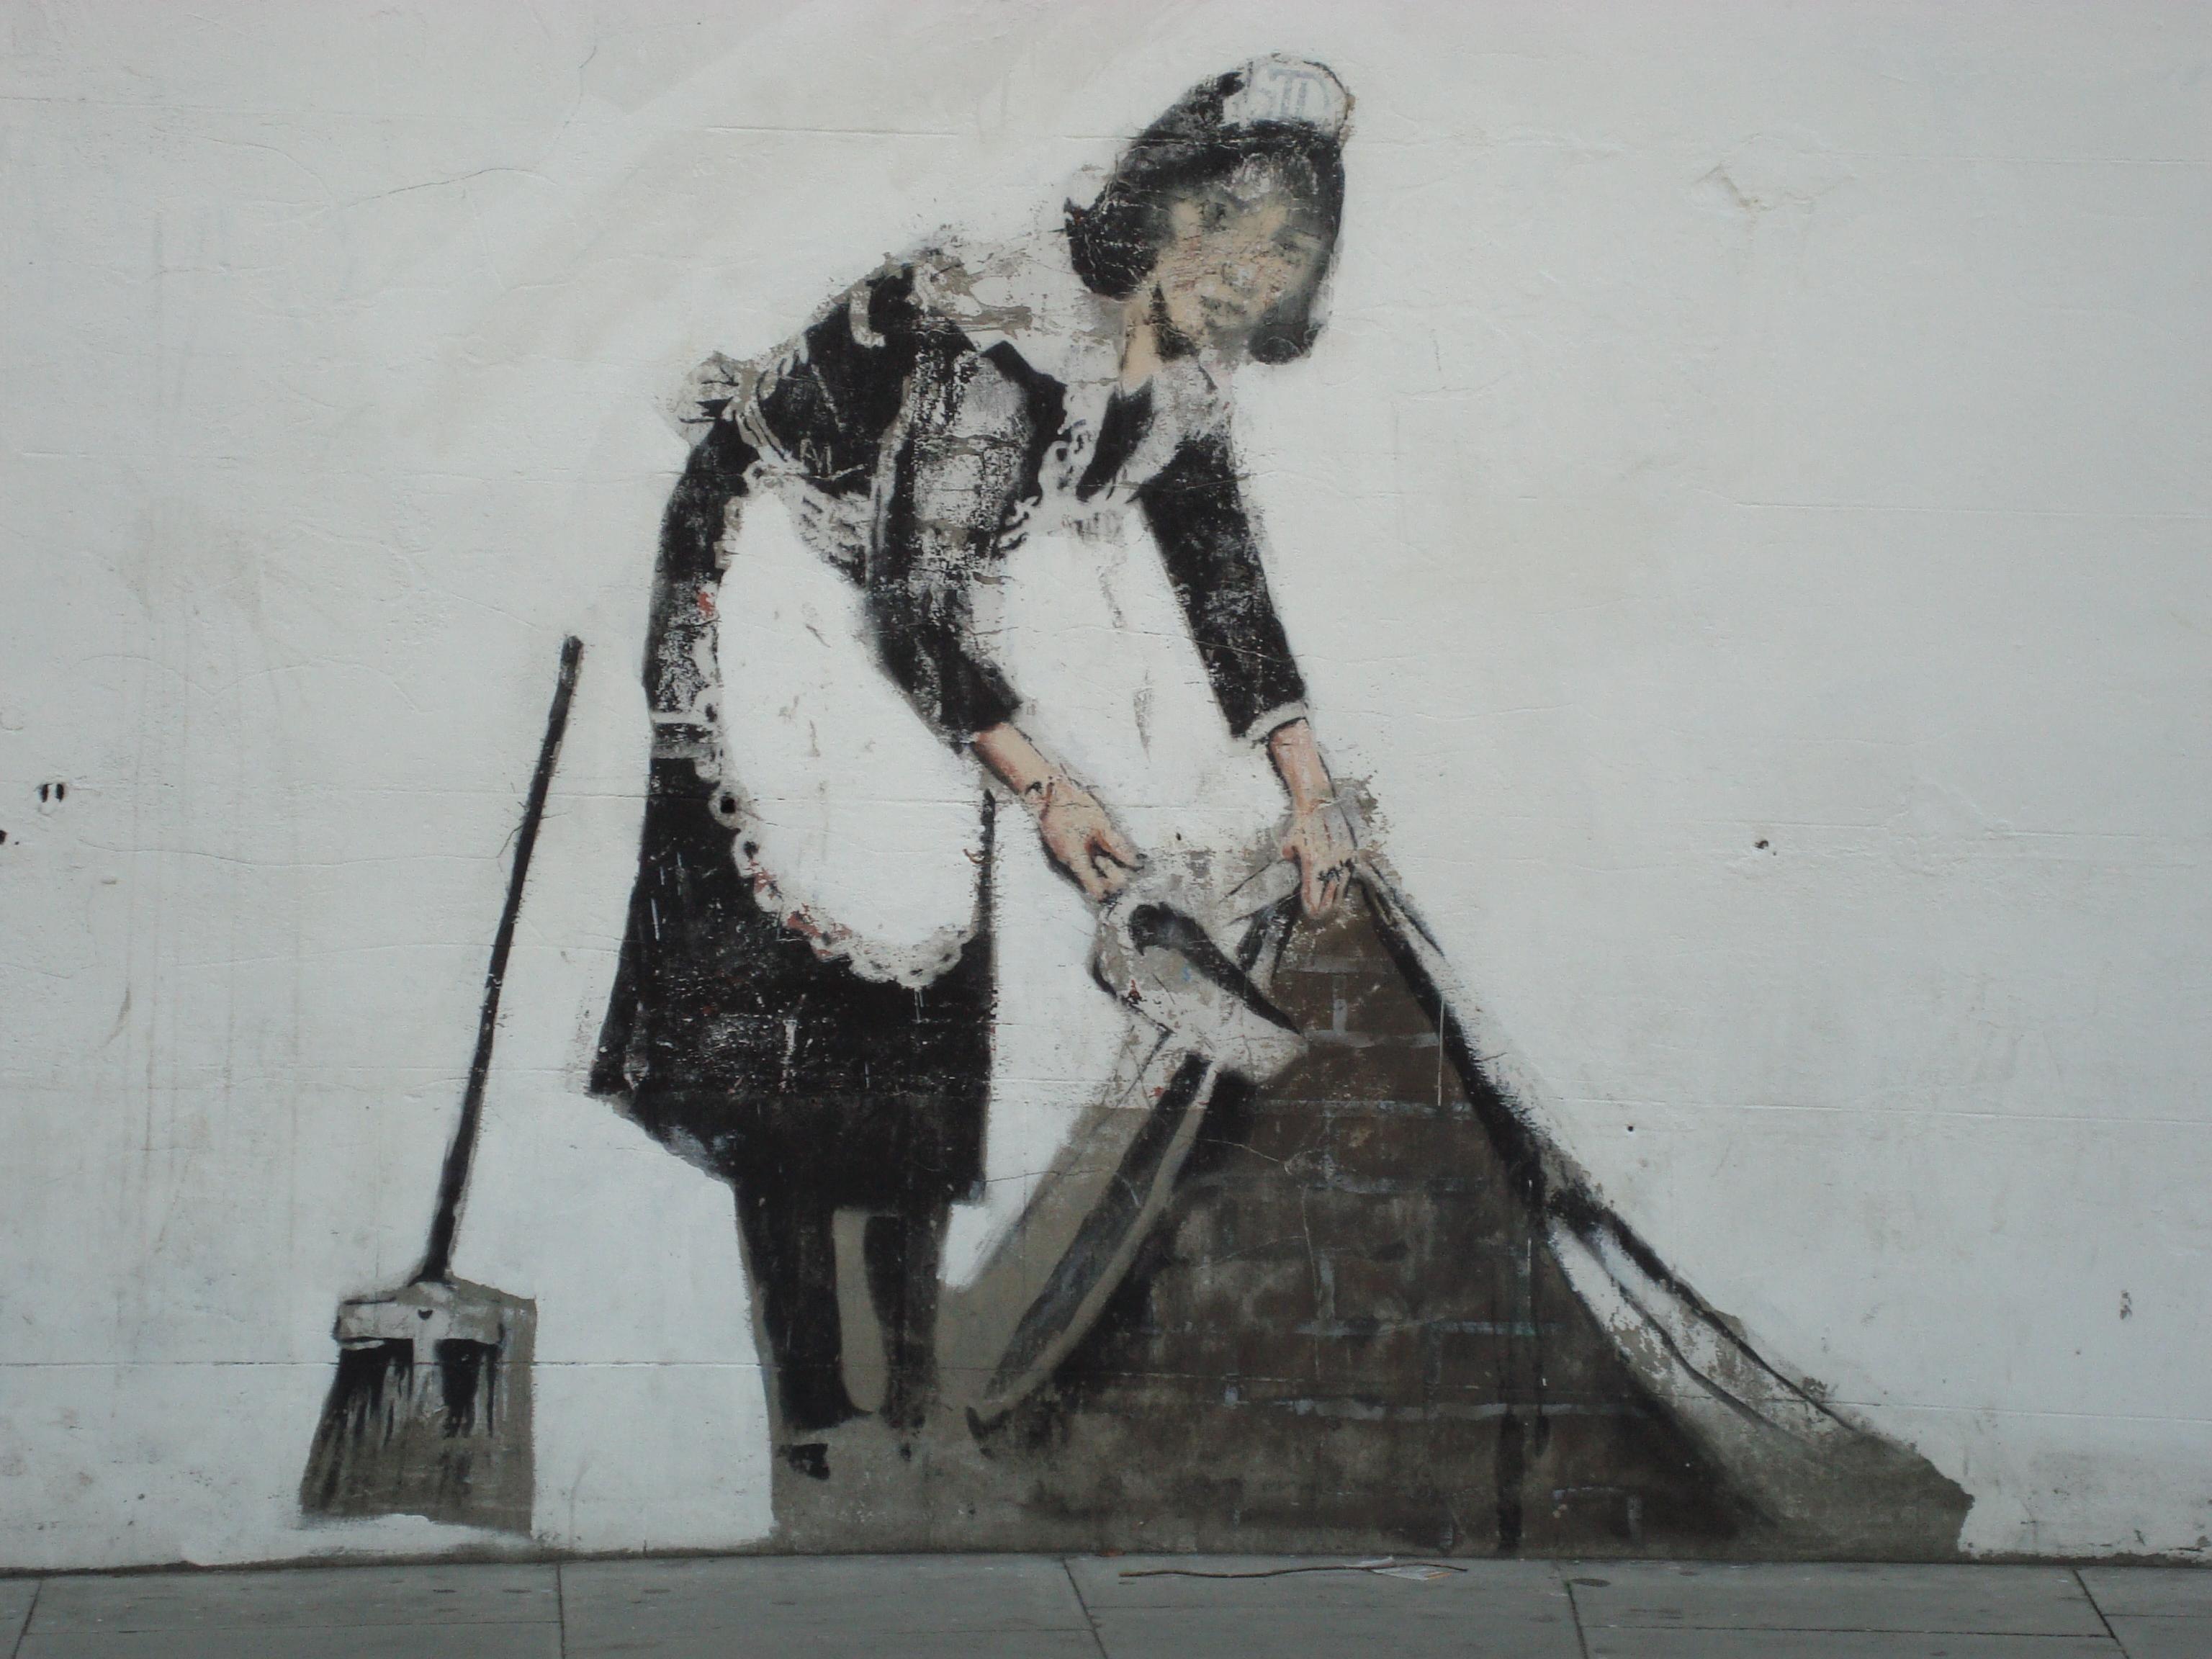 Related image Street art artists, Banksy, Banksy artist